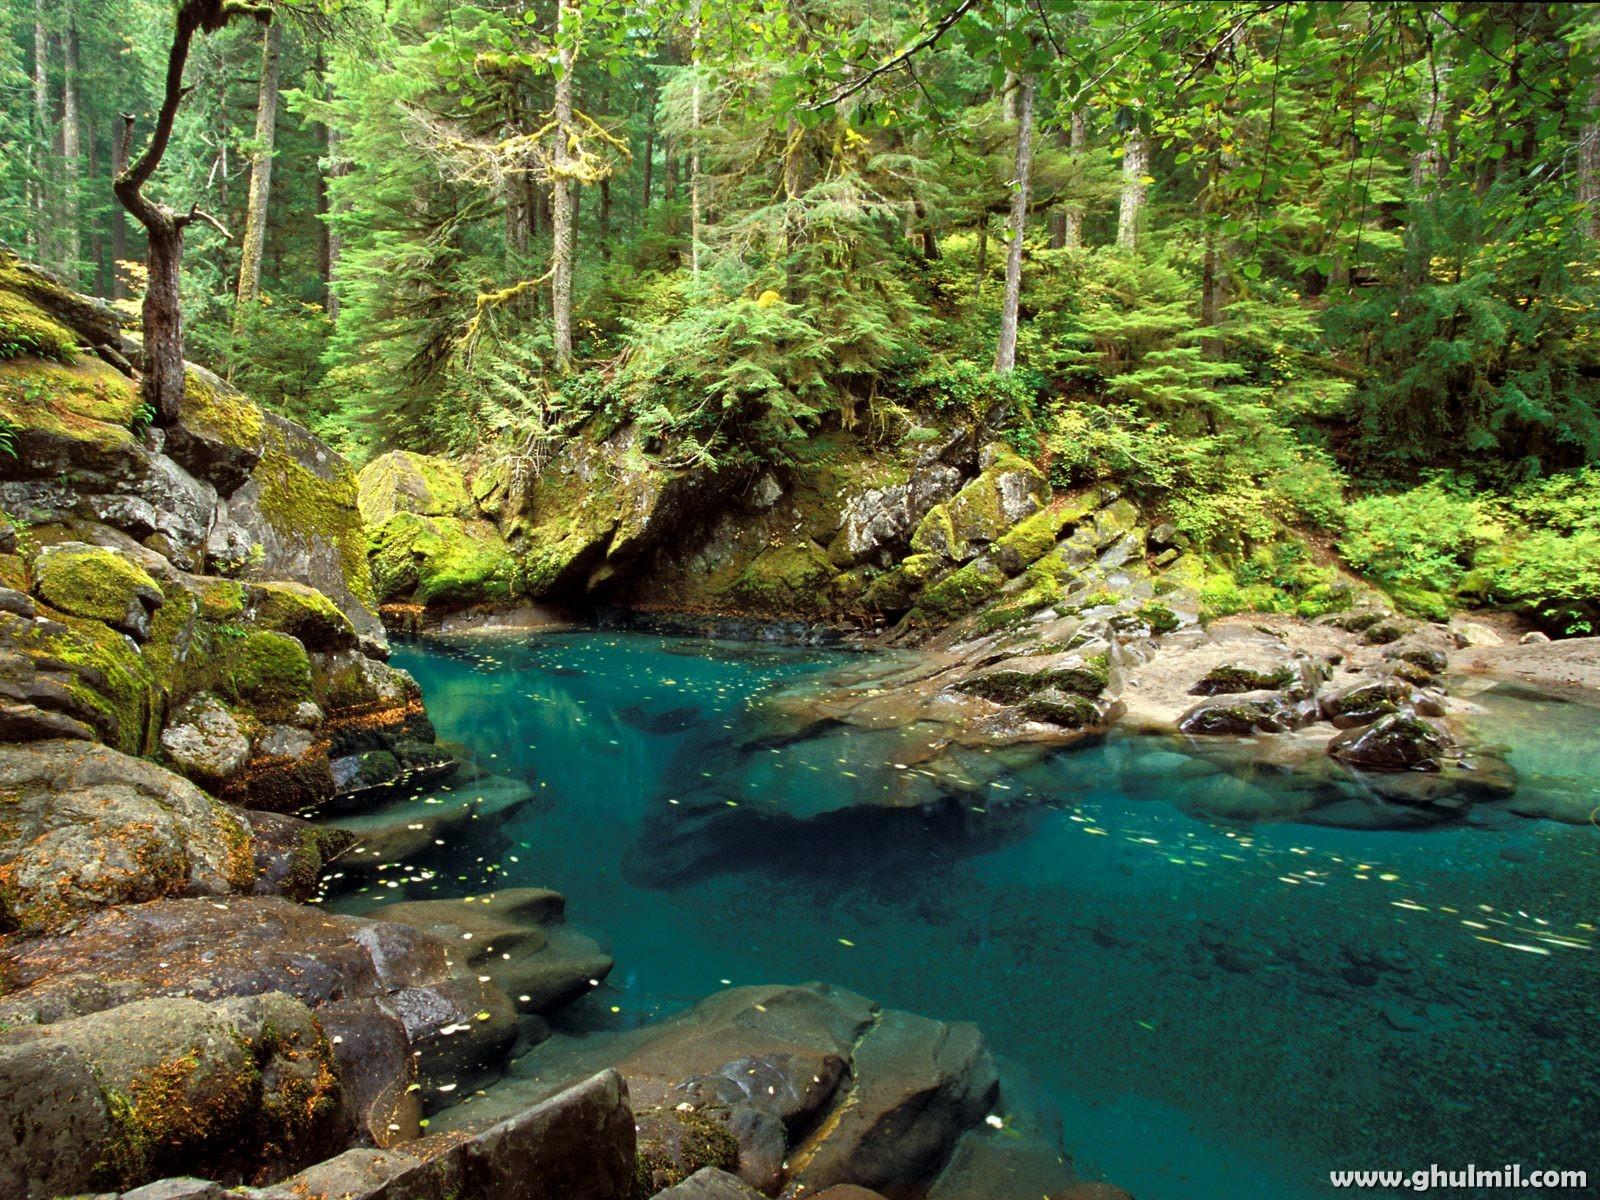 http://2.bp.blogspot.com/-OjeafynY6SY/UEvTrzNG8FI/AAAAAAAAADw/b_gjlhGsKGg/s1600/natural-scenery-or-blue-lake-wallpaper.jpg